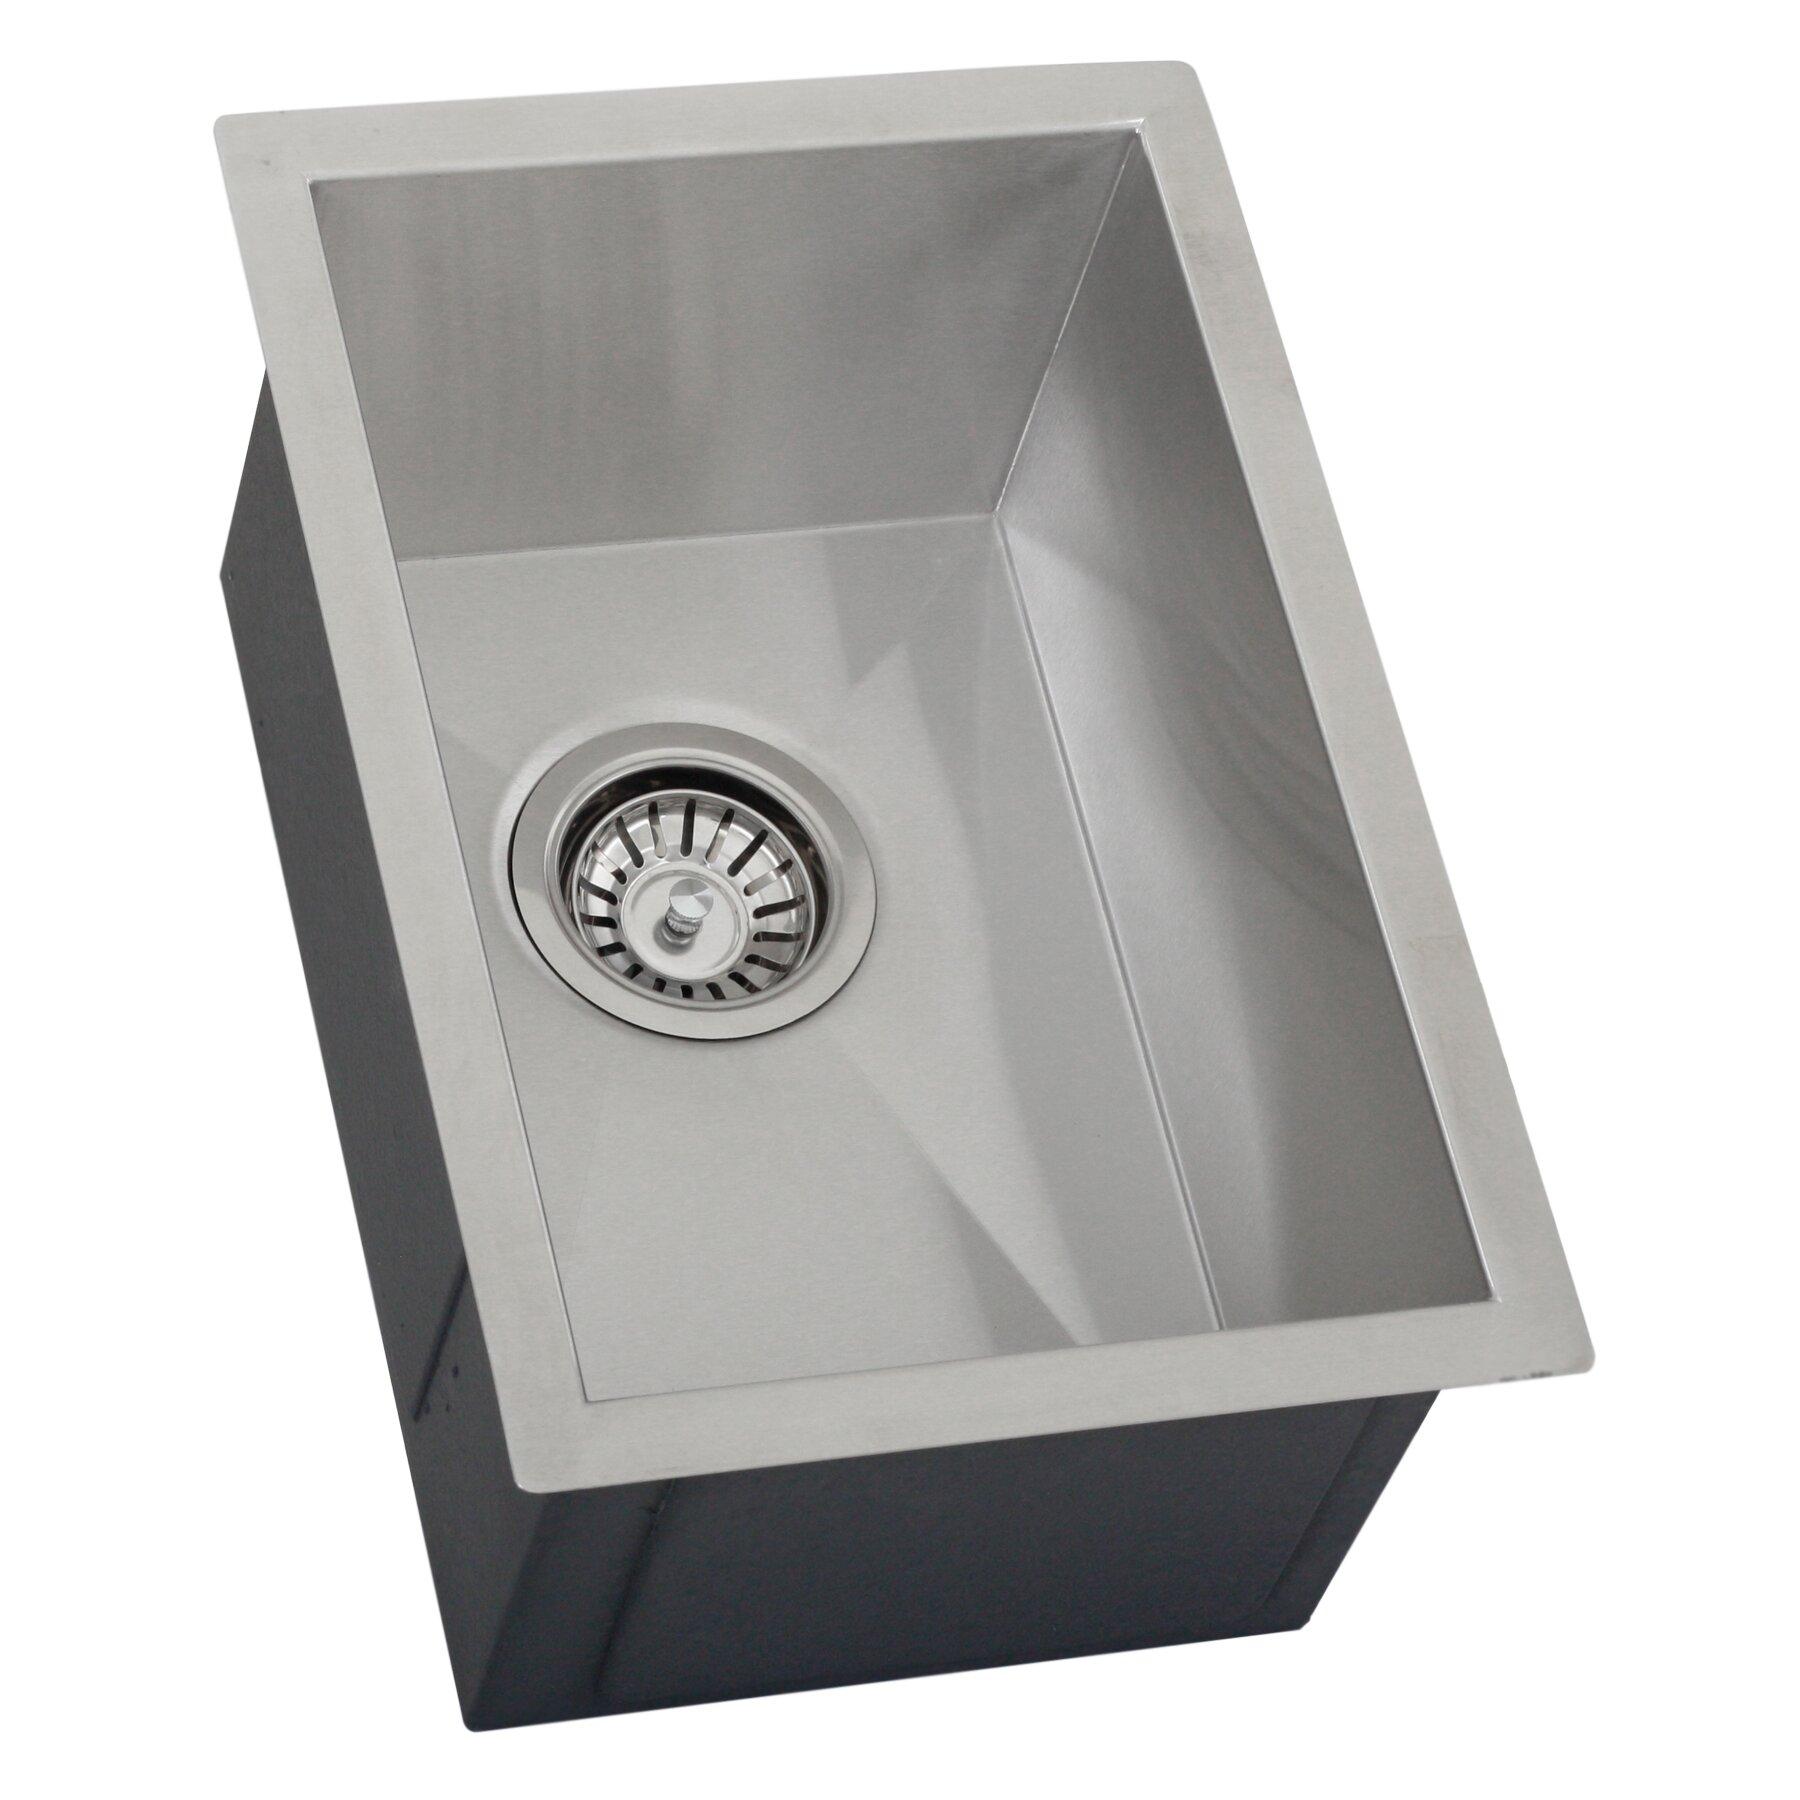 Ticor Sinks : Ticor Sinks Ticor 12